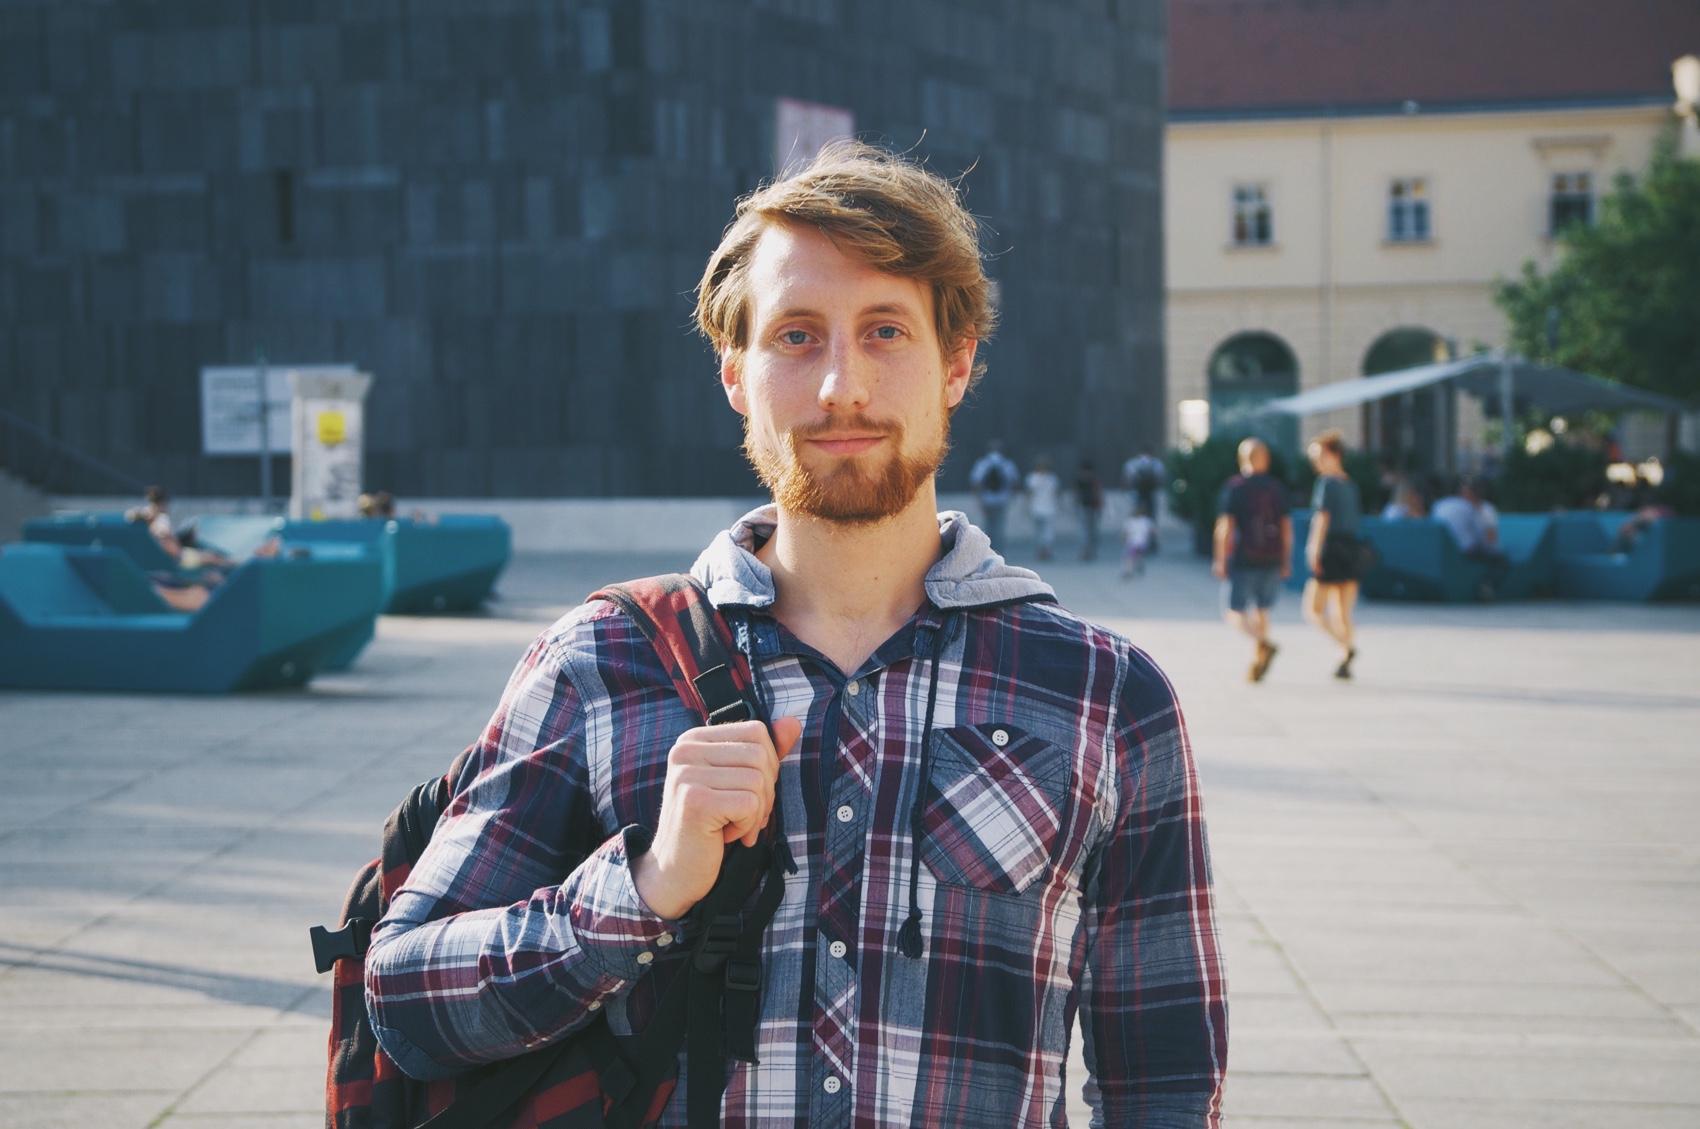 Foto: Markus Neubauer